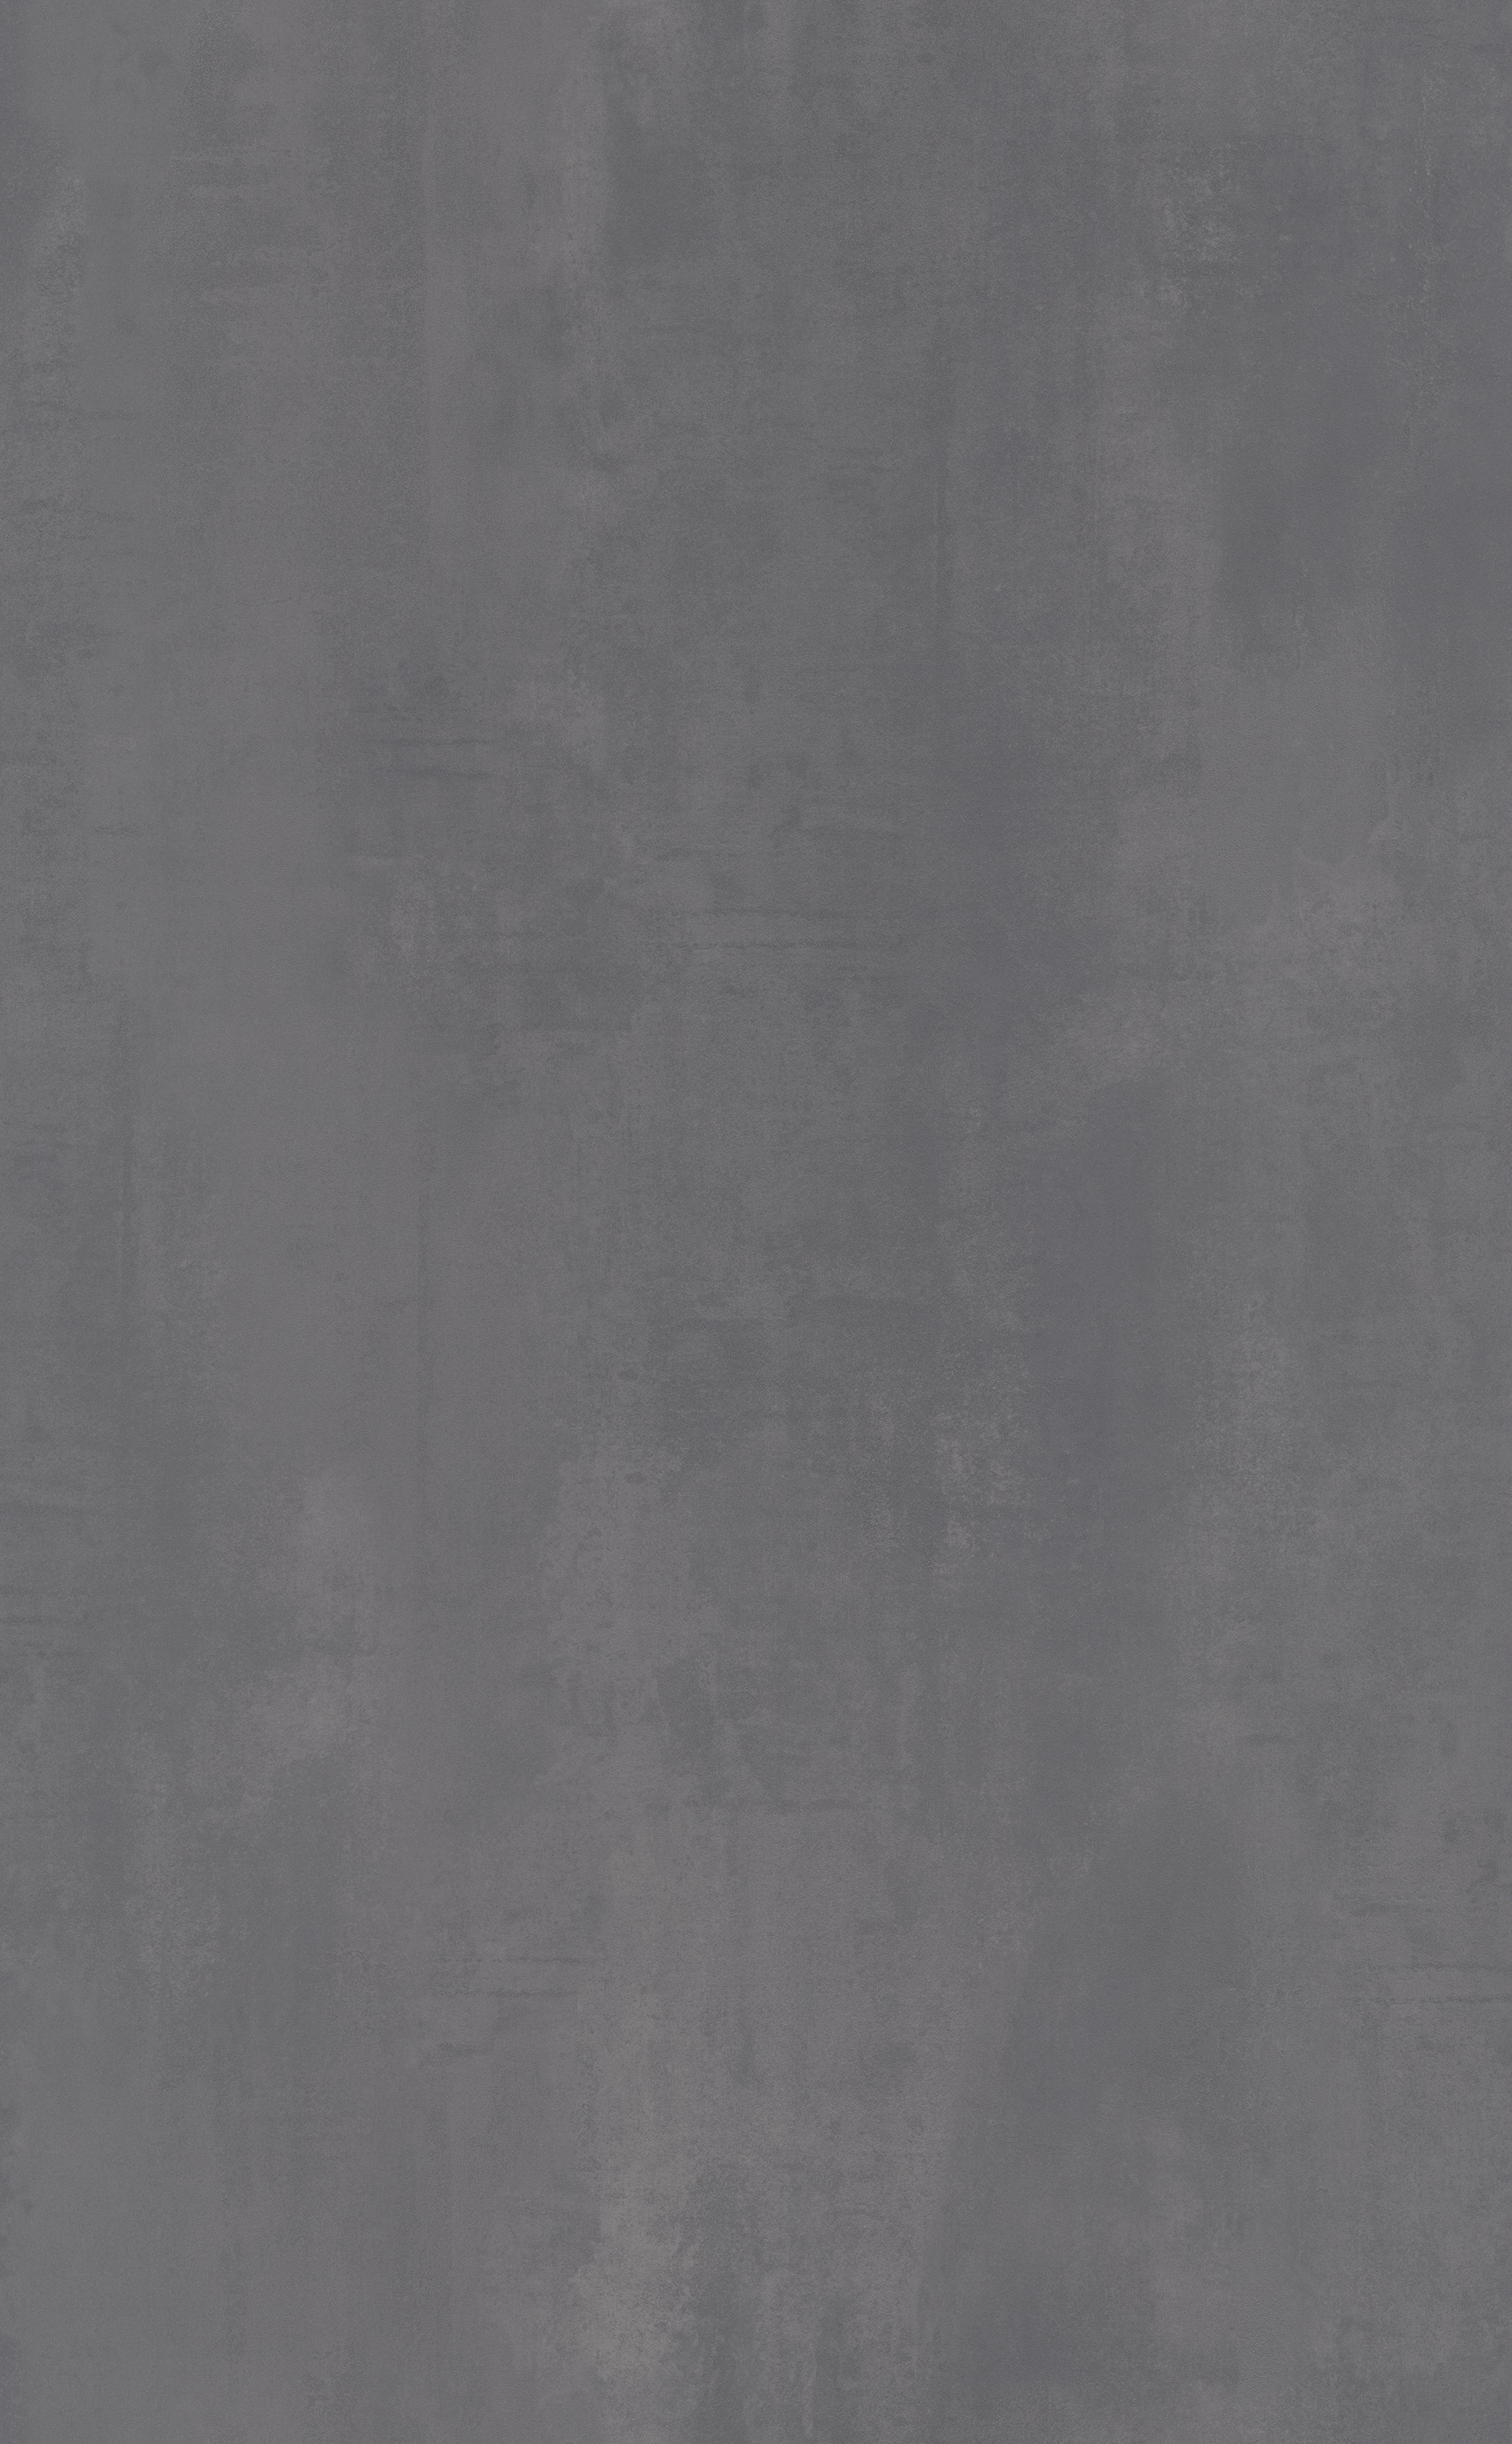 סטוקו אפור KL09DT19